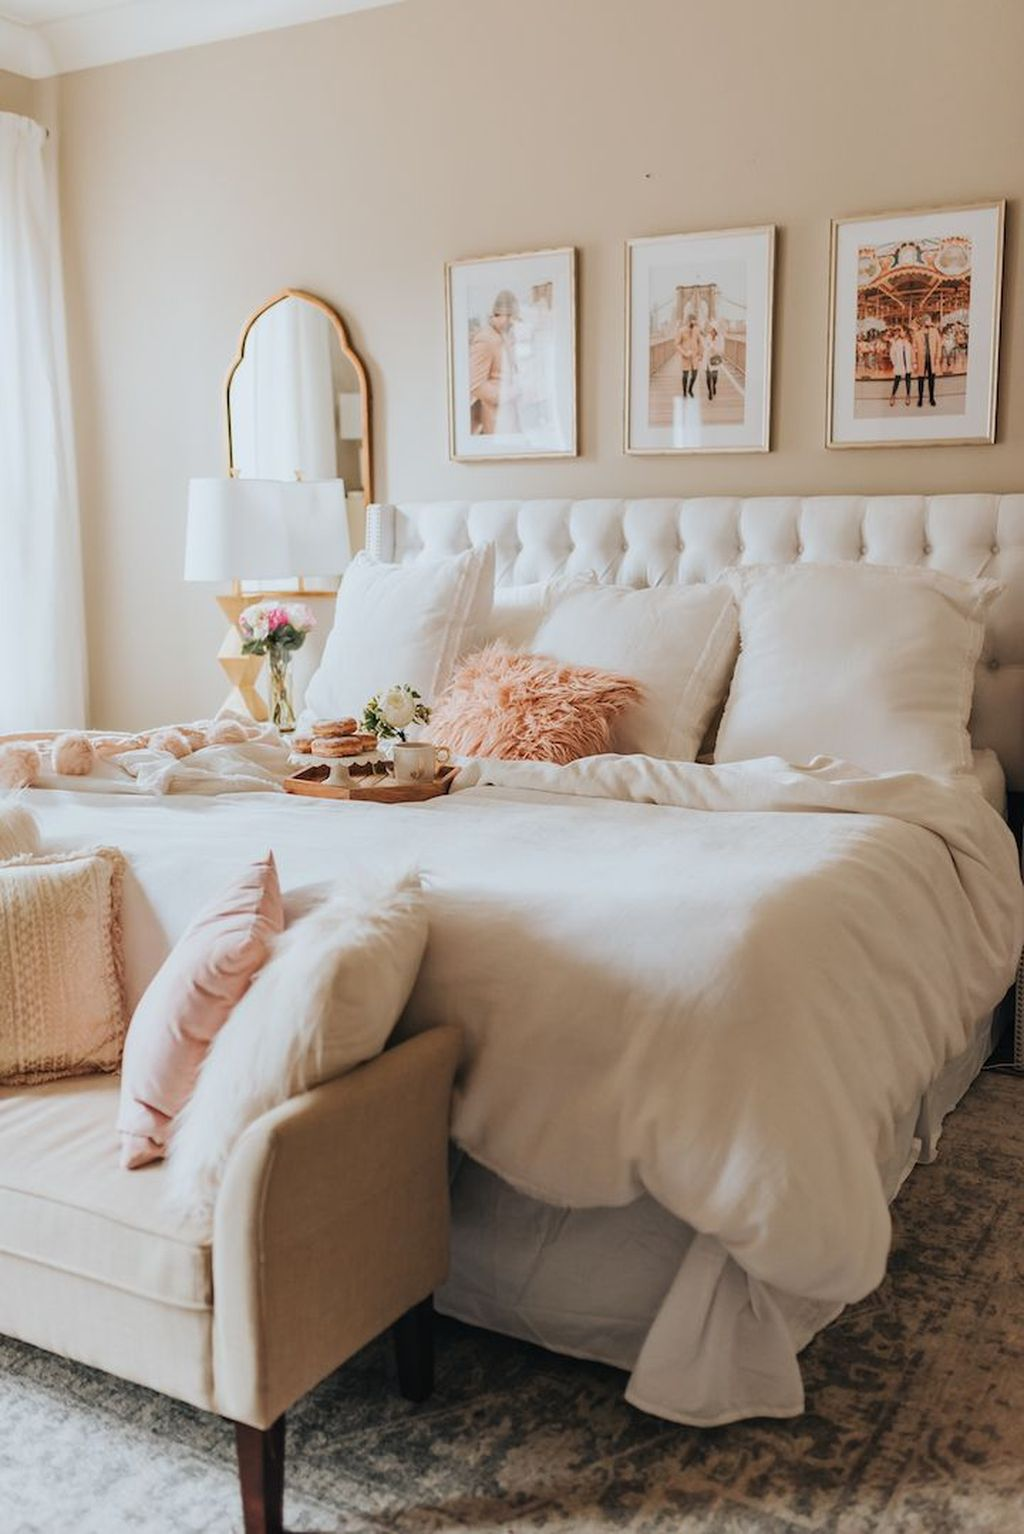 Lovely Spring Bedroom Decor Ideas Trending This Year 24